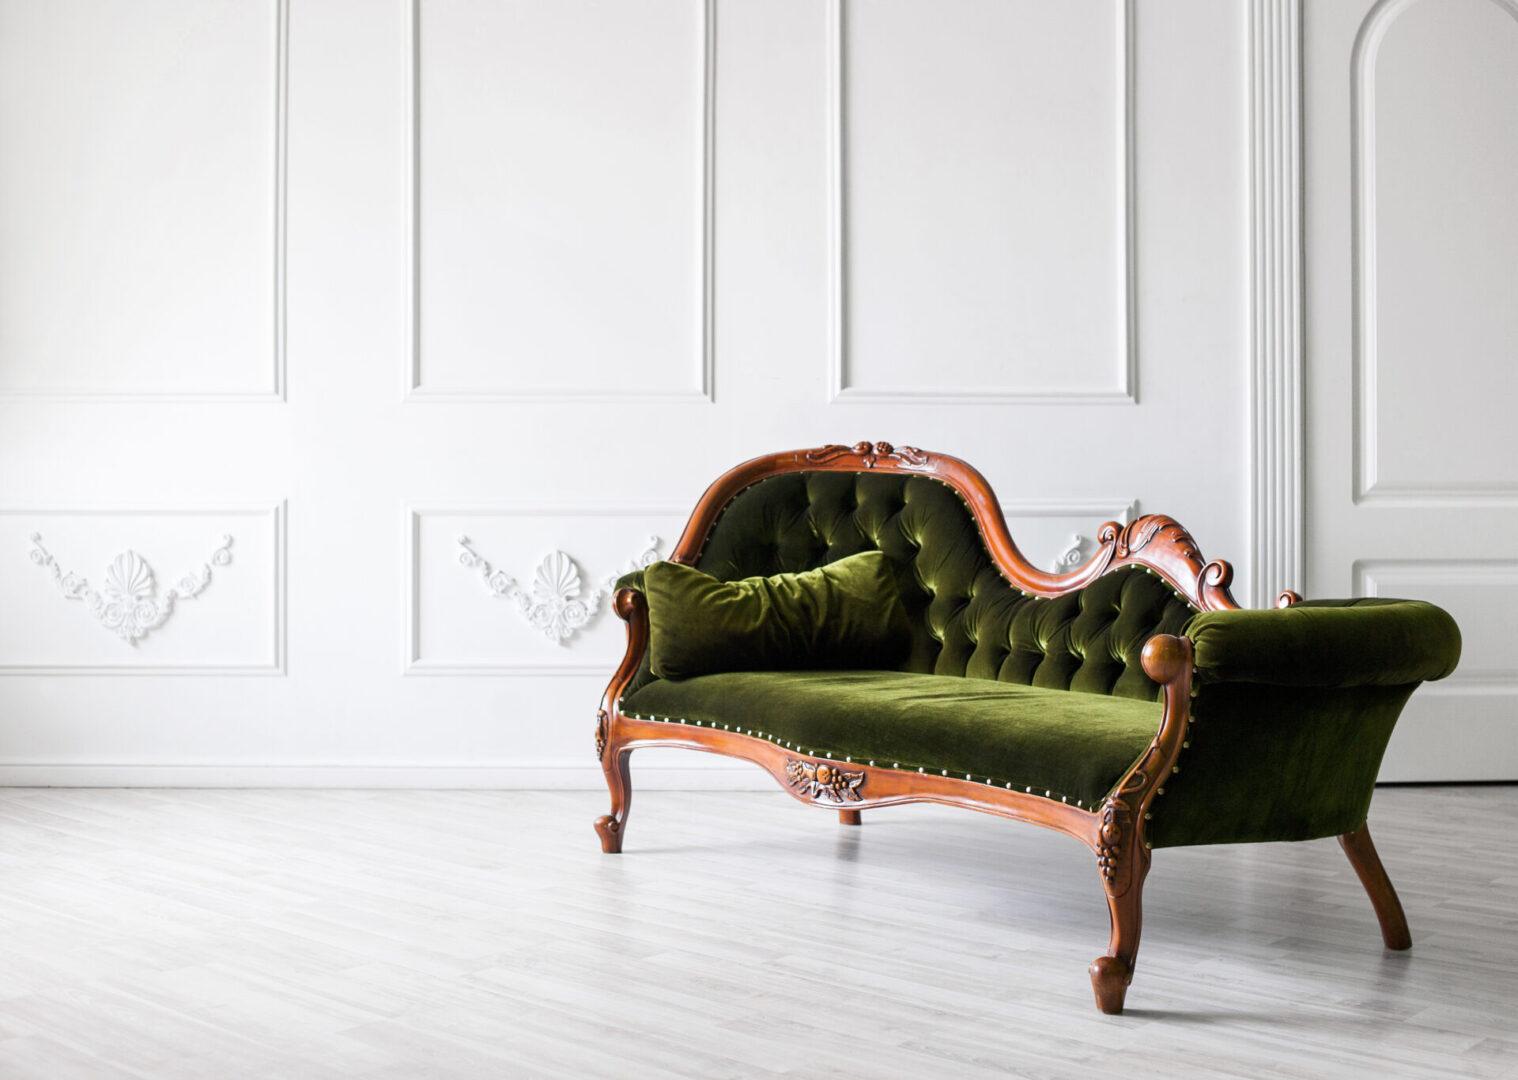 Beautiful classic sofa in a living room